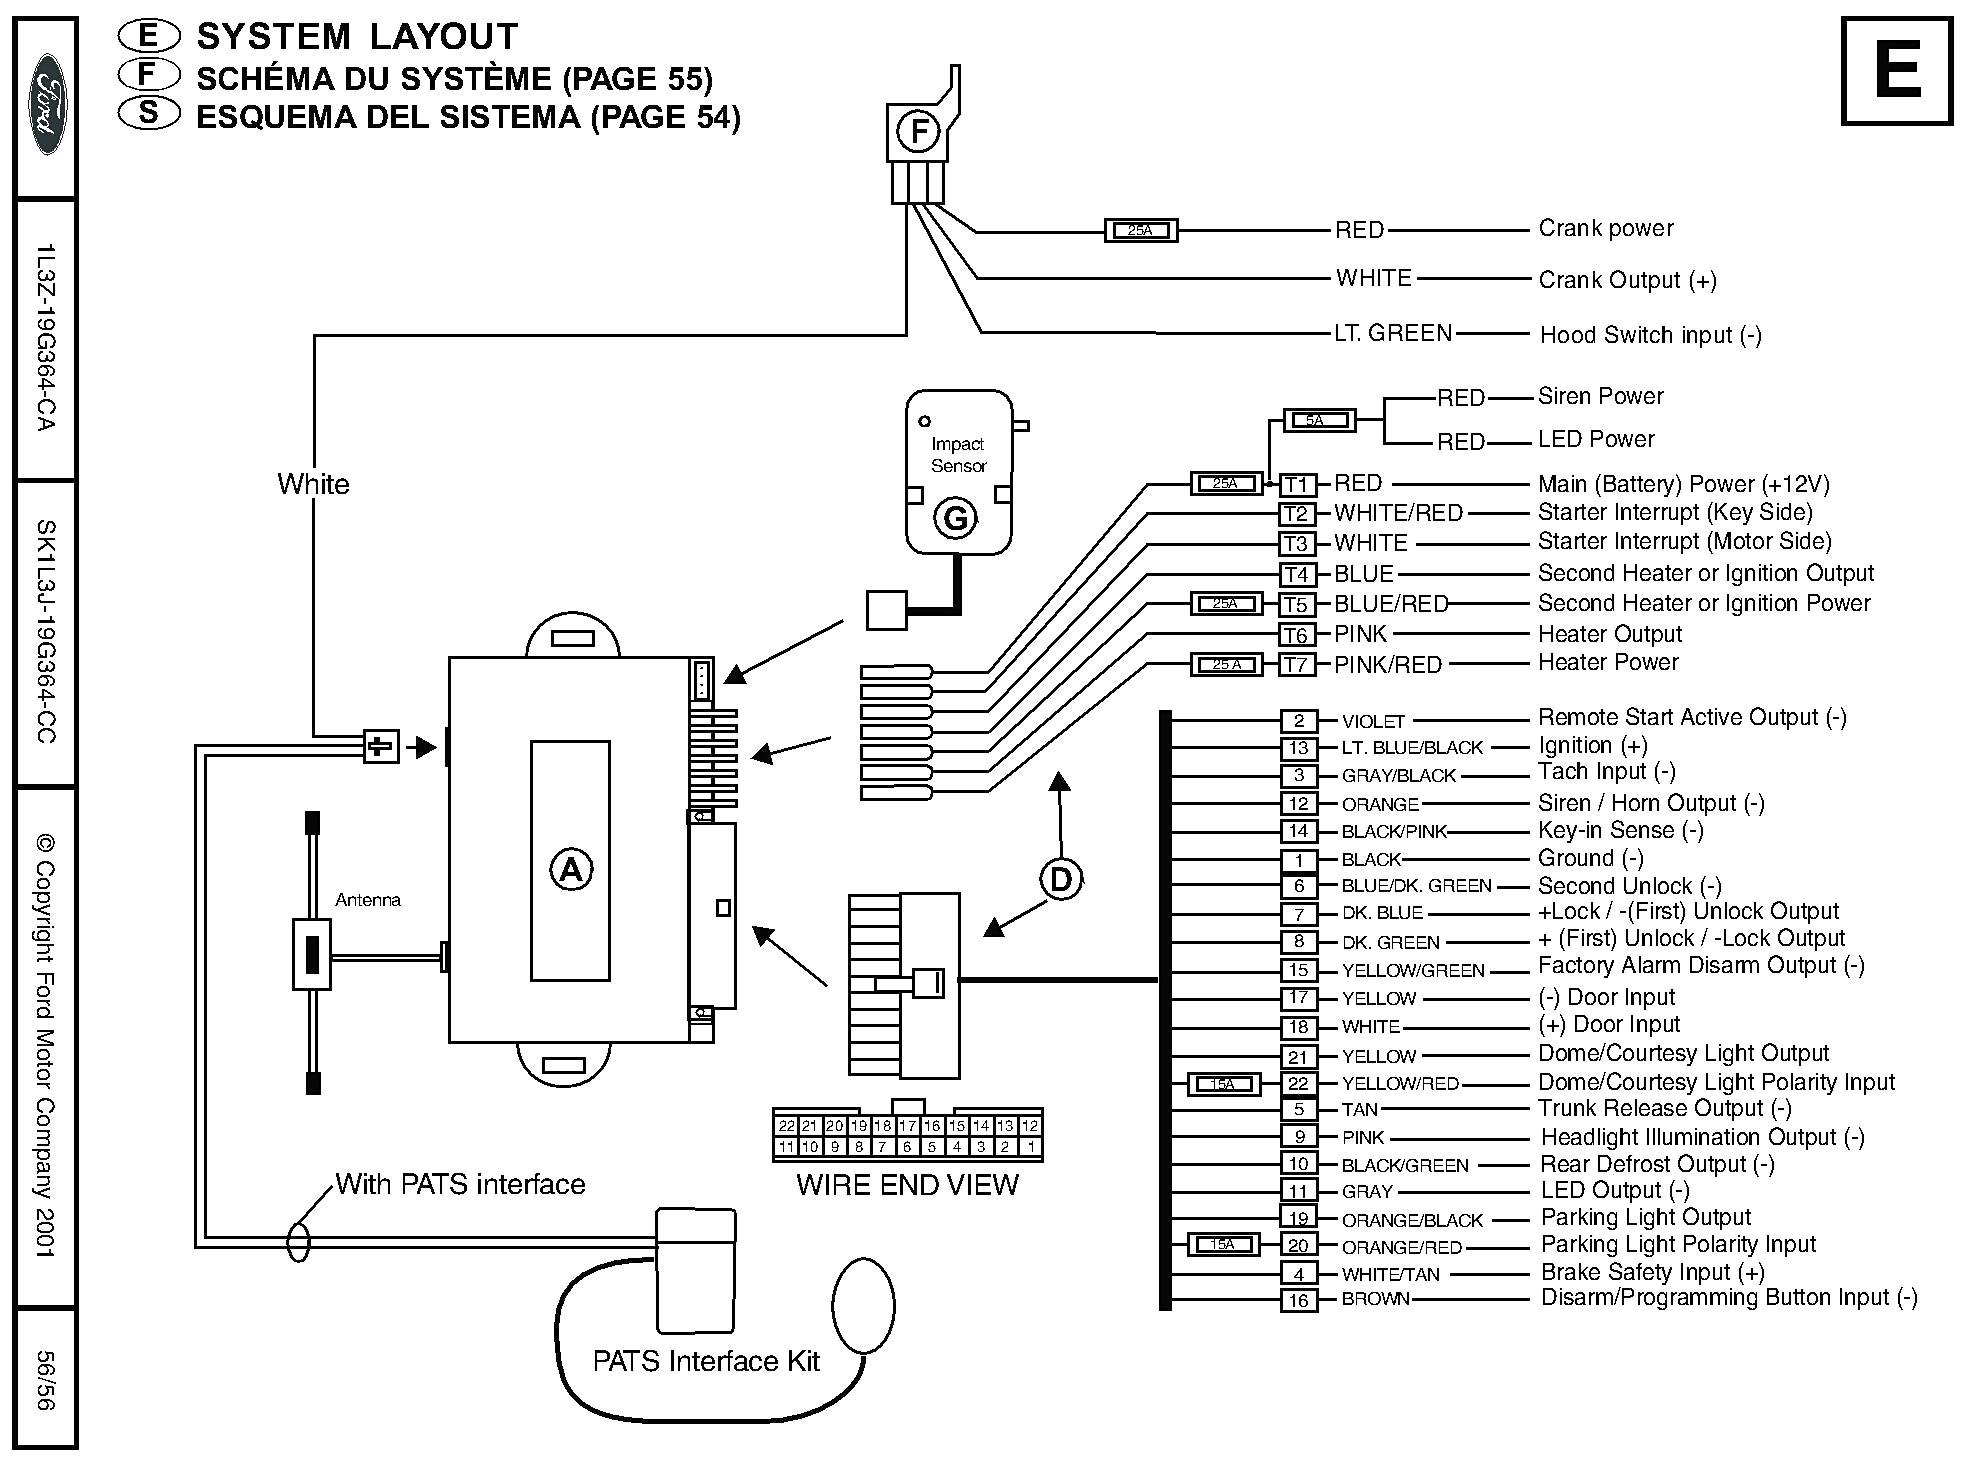 Car Alarm System Wiring Diagram Car Security System Wiring Diagram New Motorcycle Alarm System Of Car Alarm System Wiring Diagram